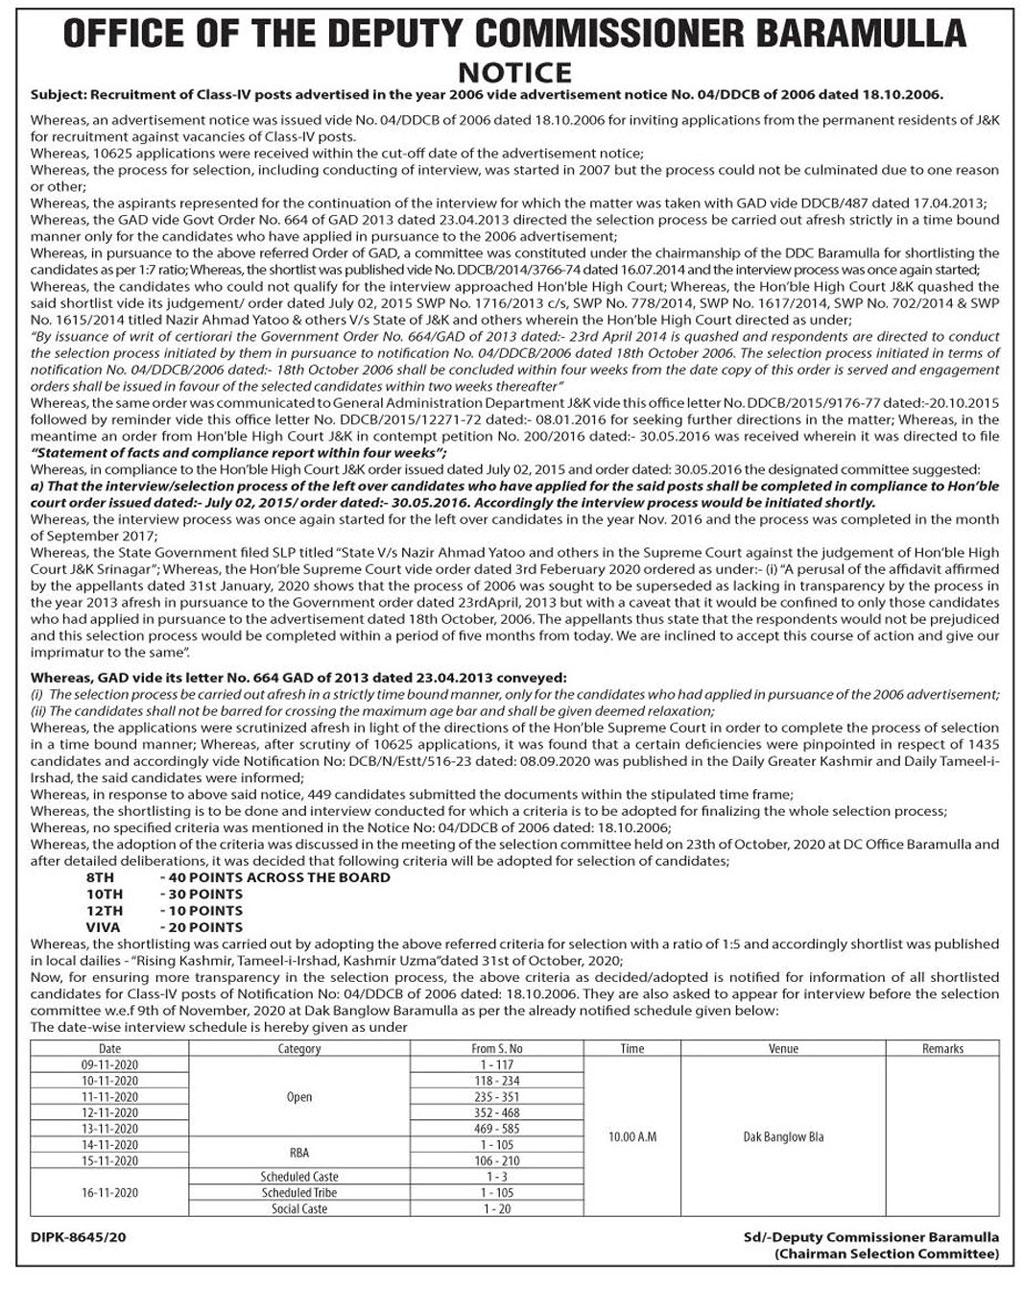 DC Baramulla Recruitment of Class-IV posts: Interview Schedule.